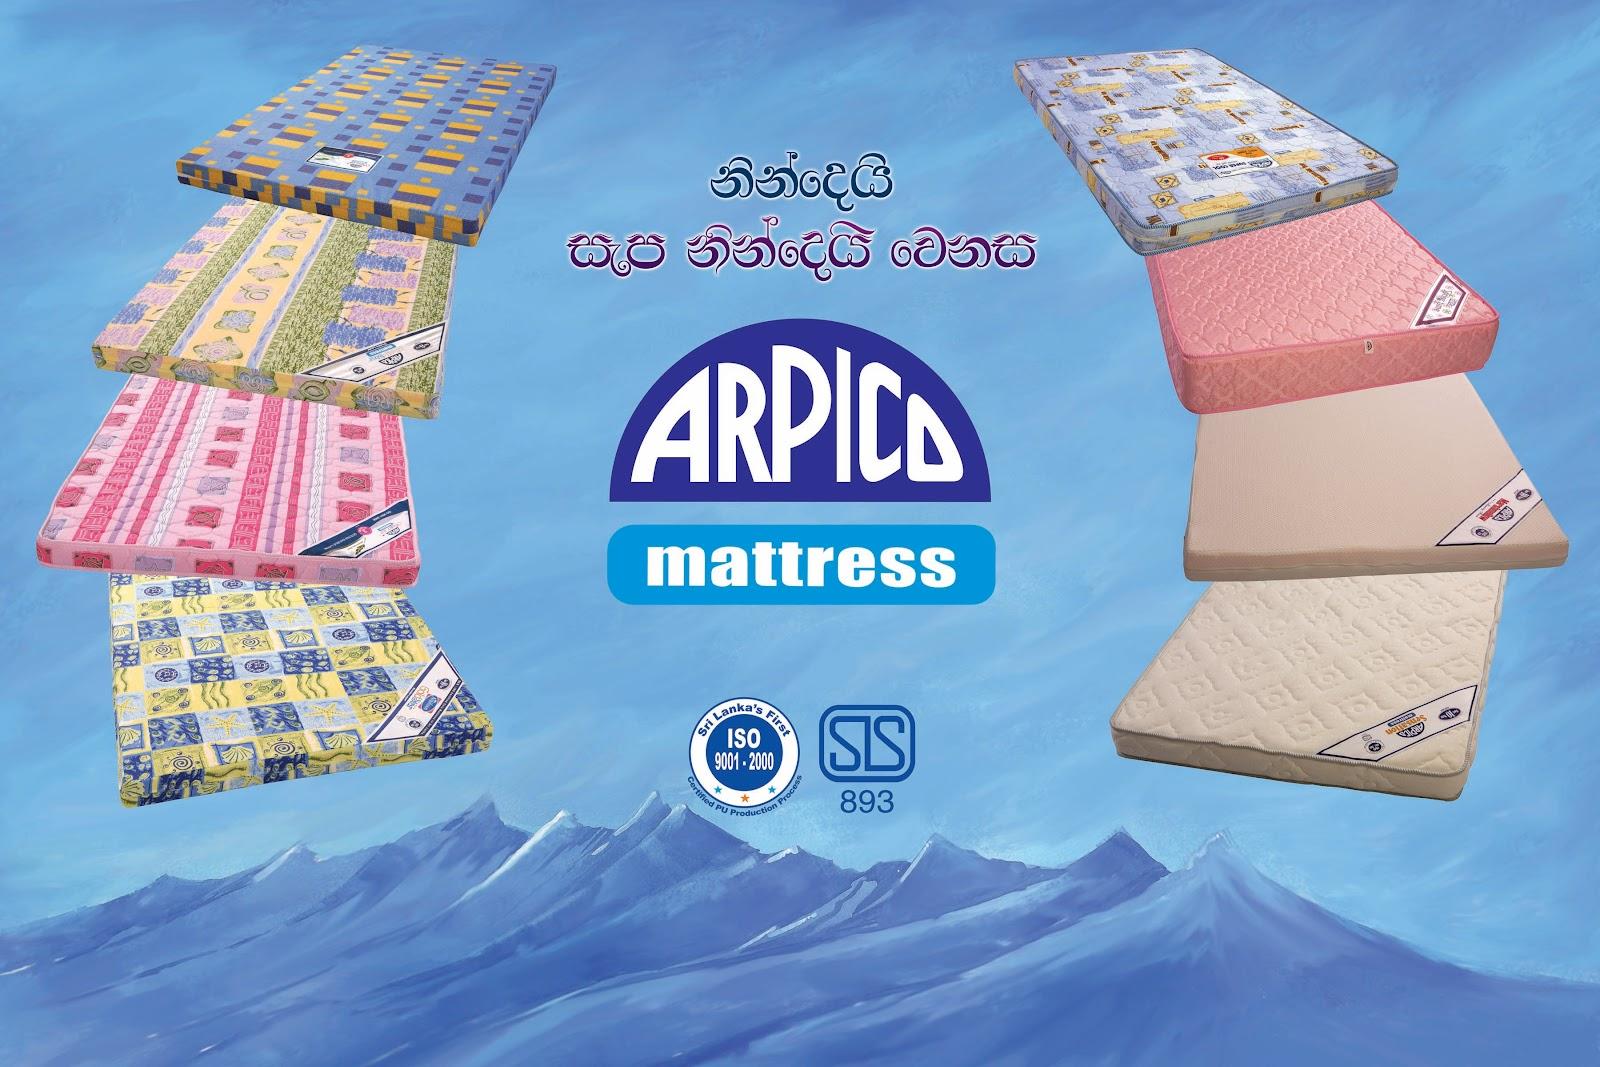 Arpico Mattress And Pu Foams Sponge